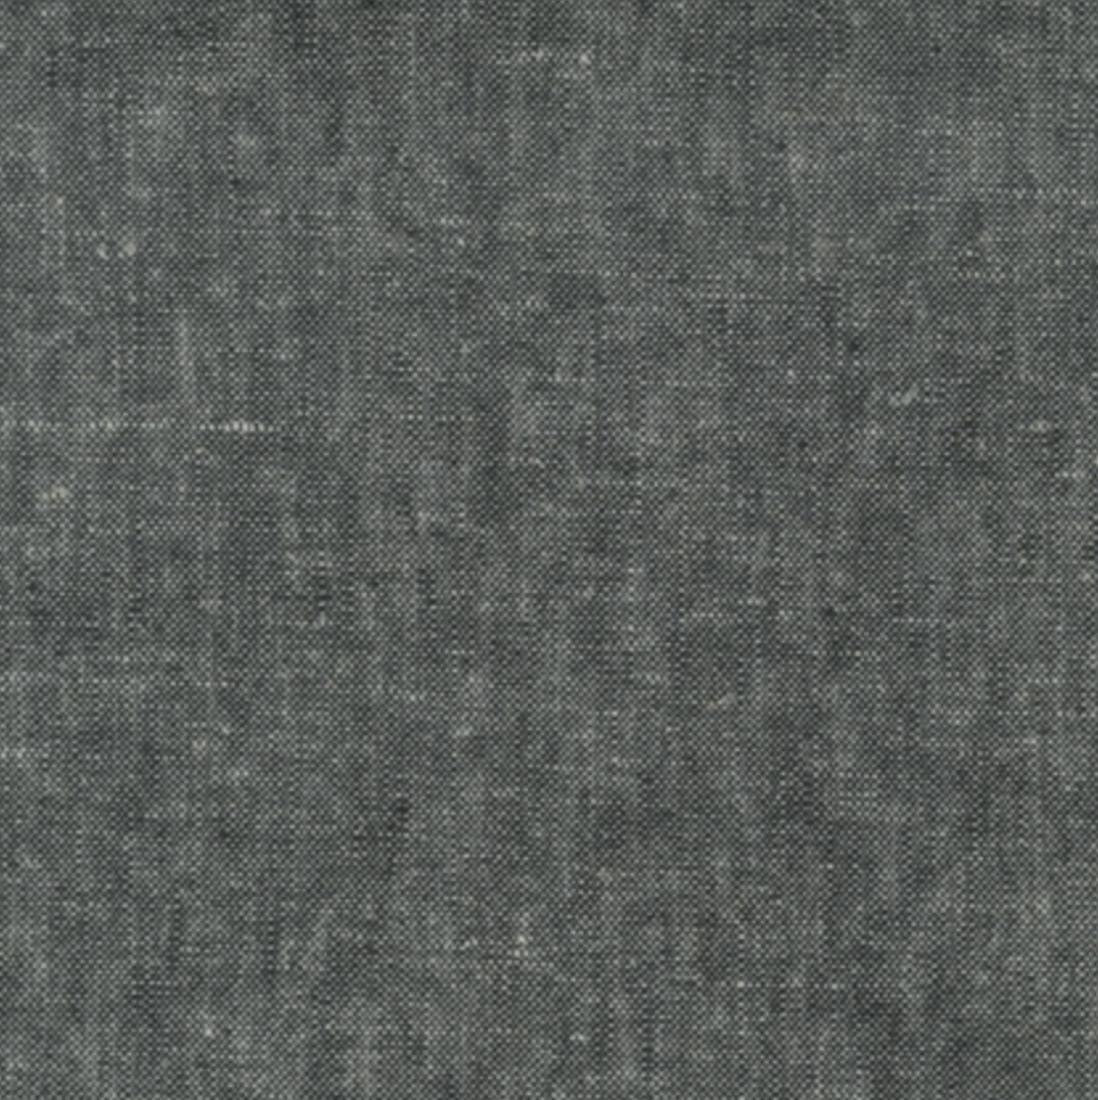 Brussels Washer - Black Yarn Dyed - Robert Kaufman